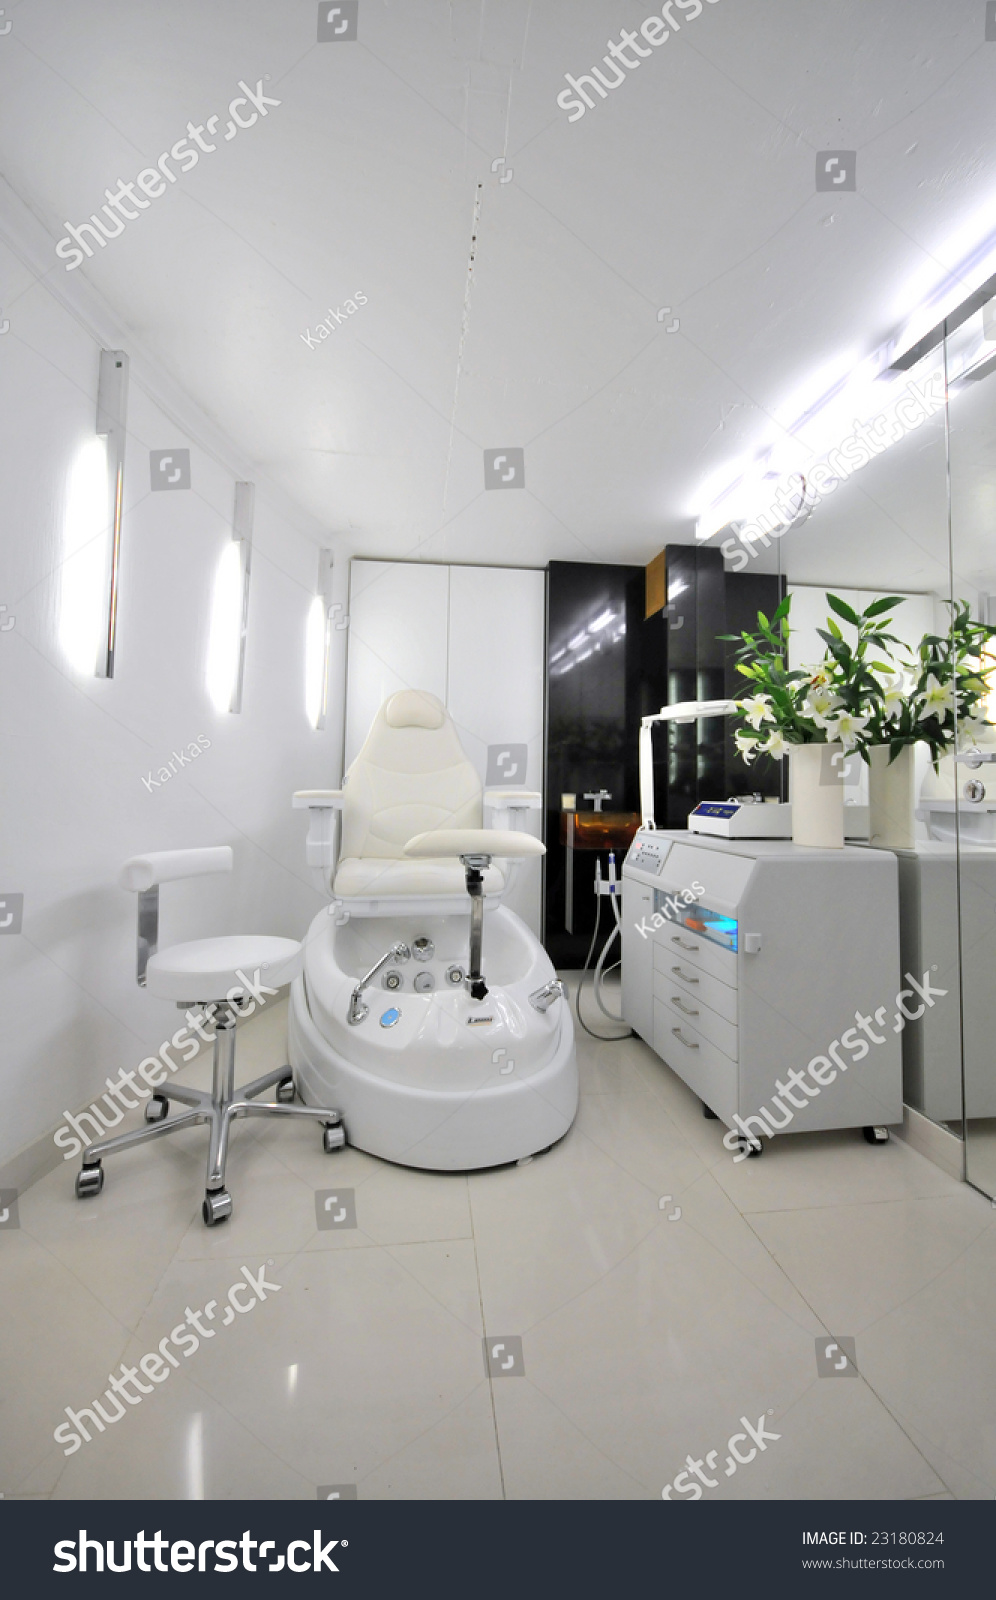 Cosmetic Salon Stock Photo 23180824 - Shutterstock